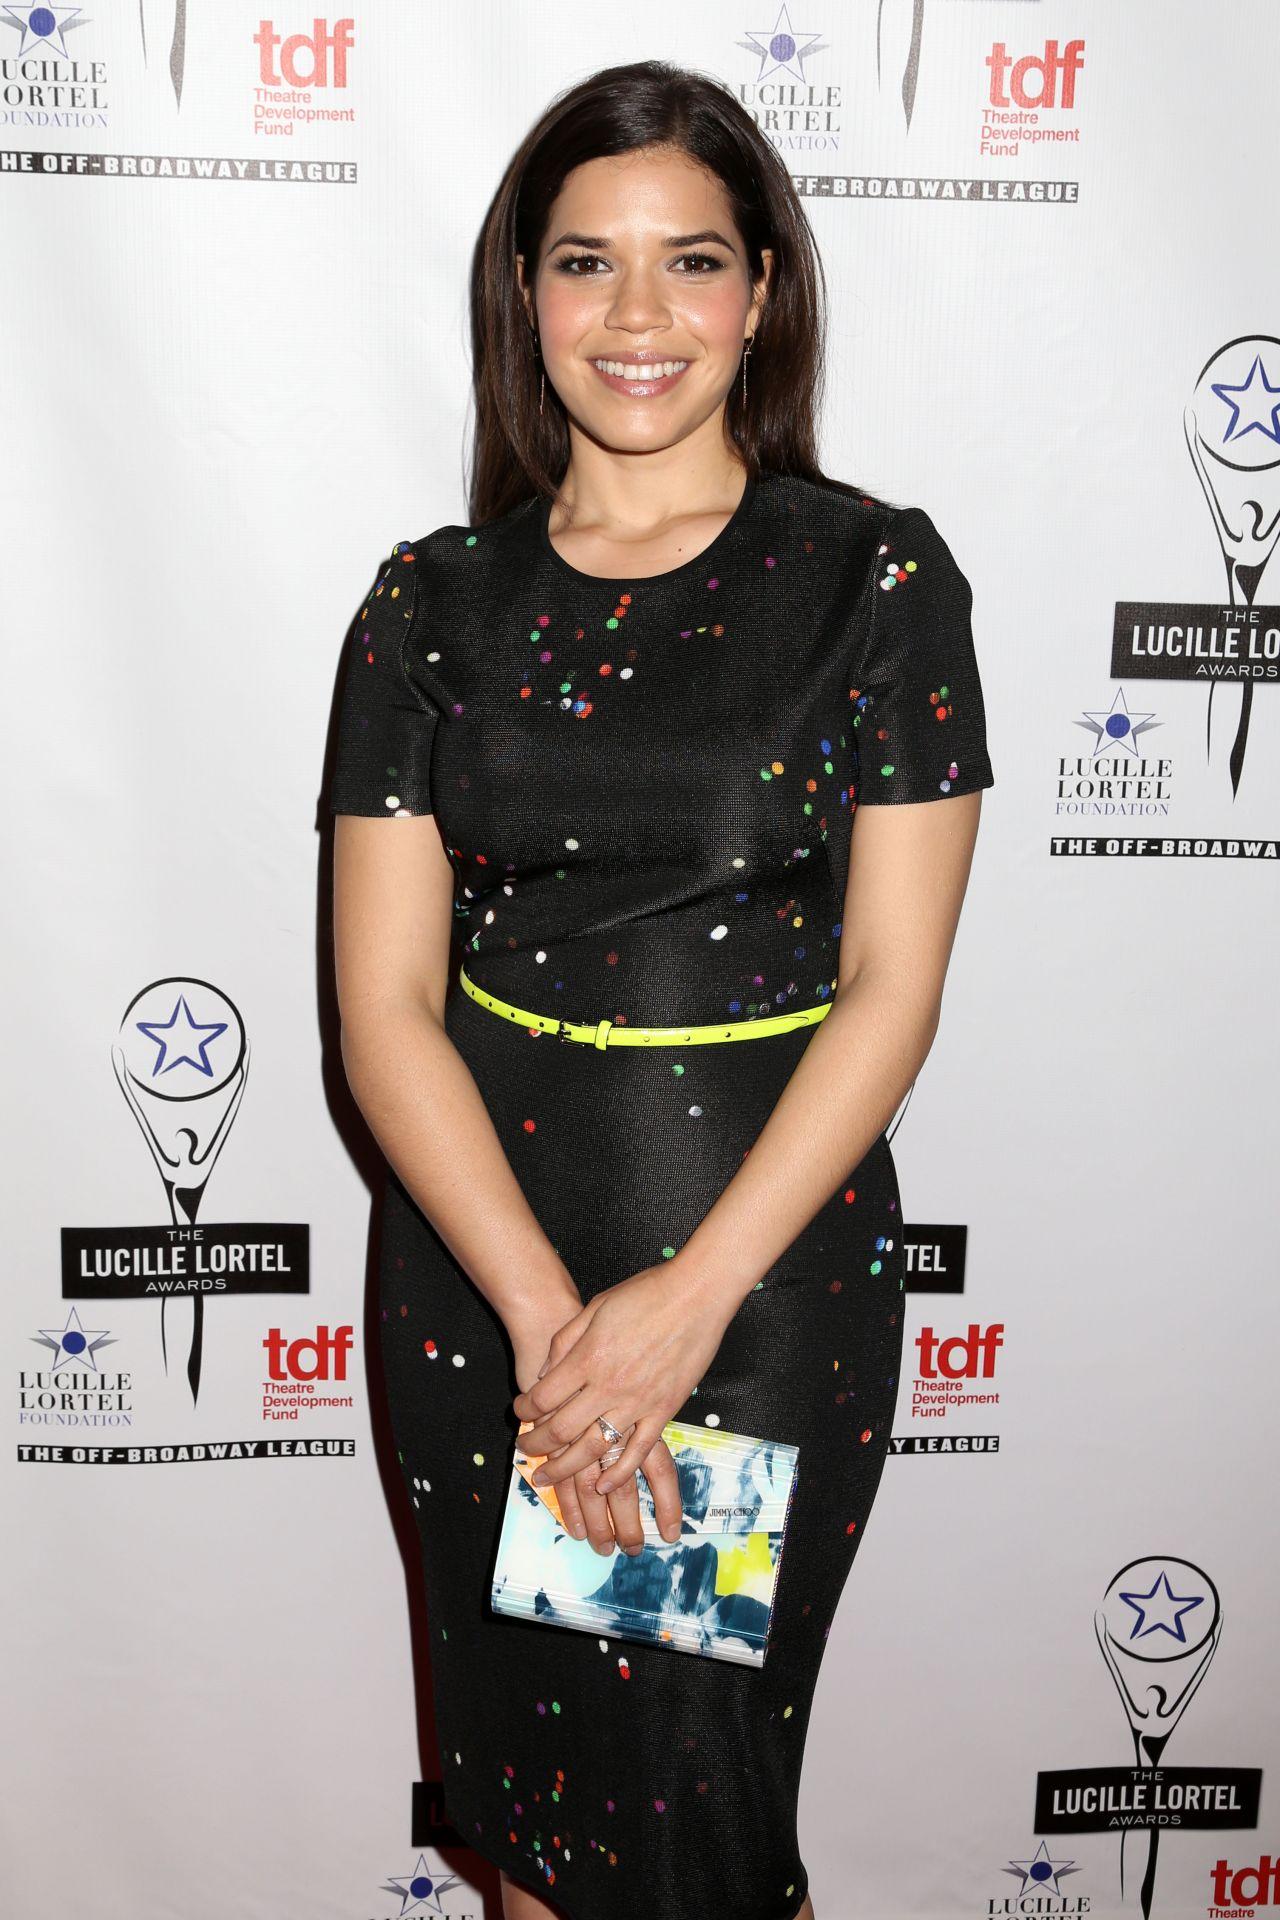 America Ferrera - 2014 Lucille Lortel Awards